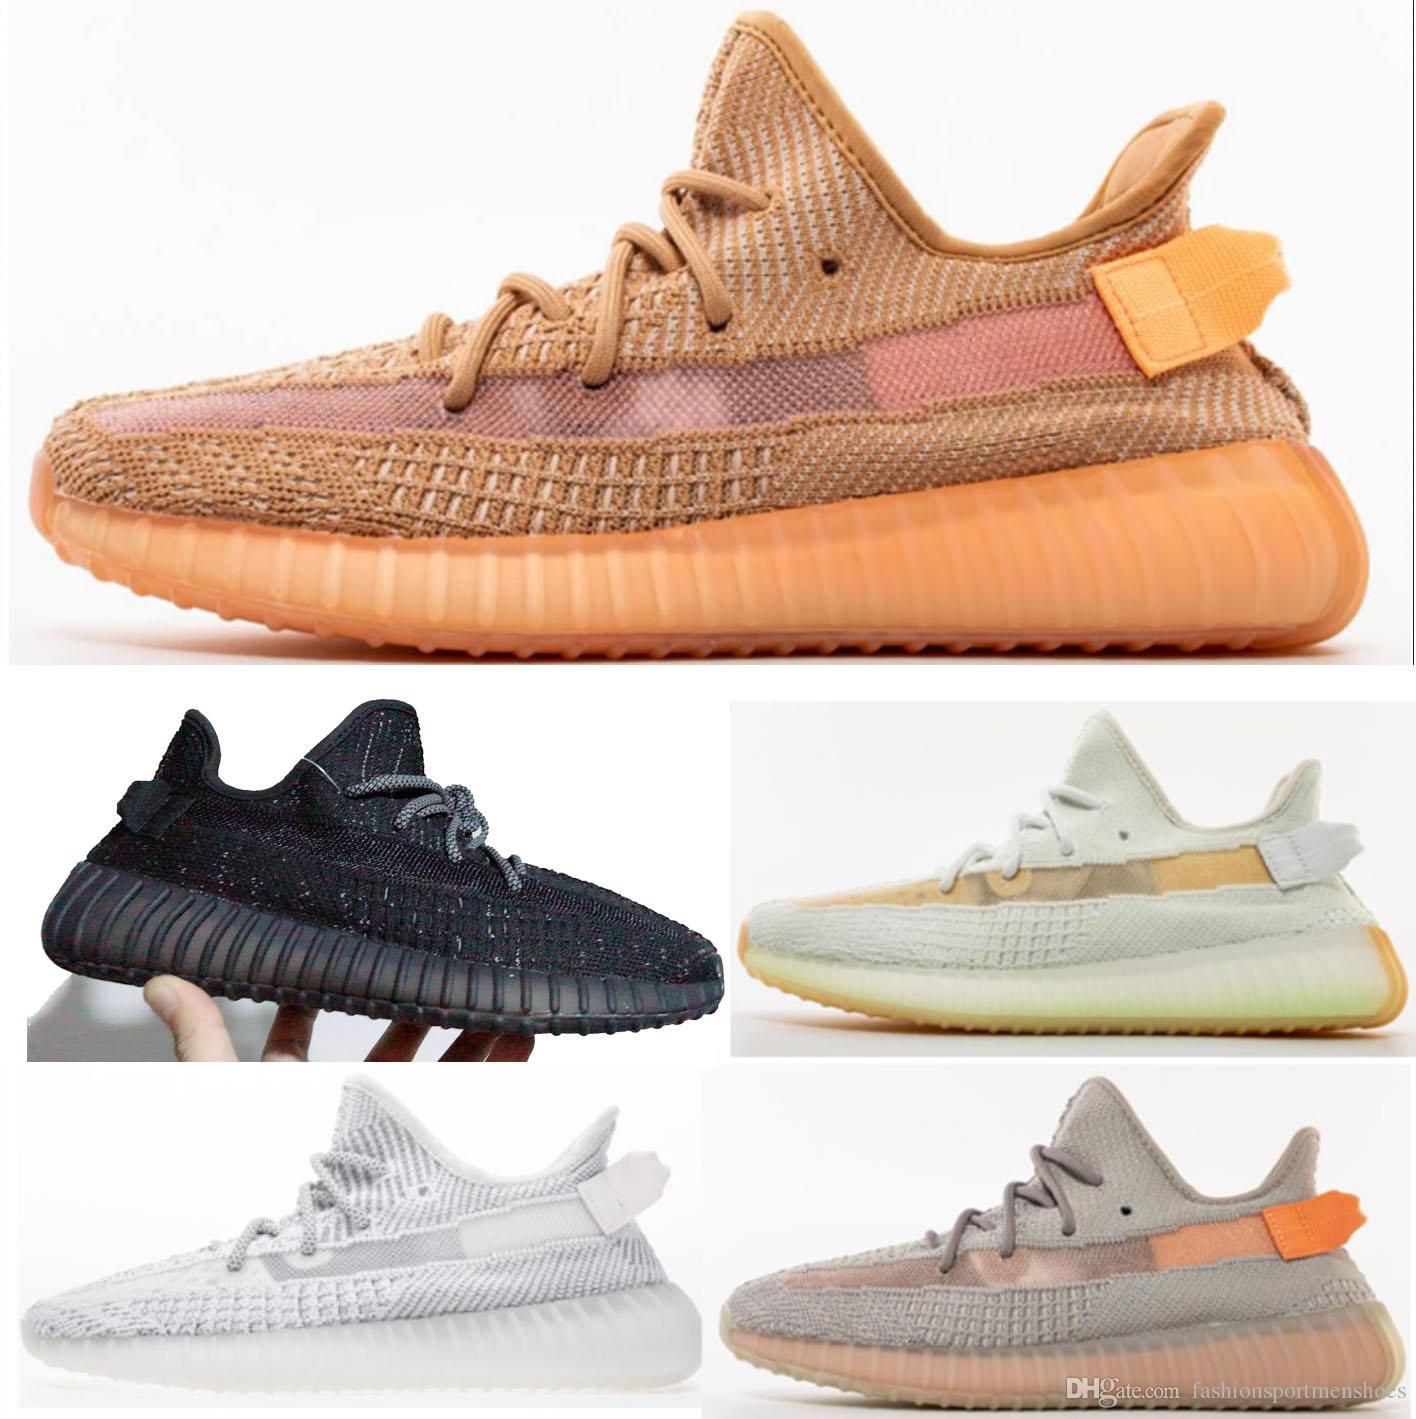 Compre Designer Shoes Adidas Yeezy